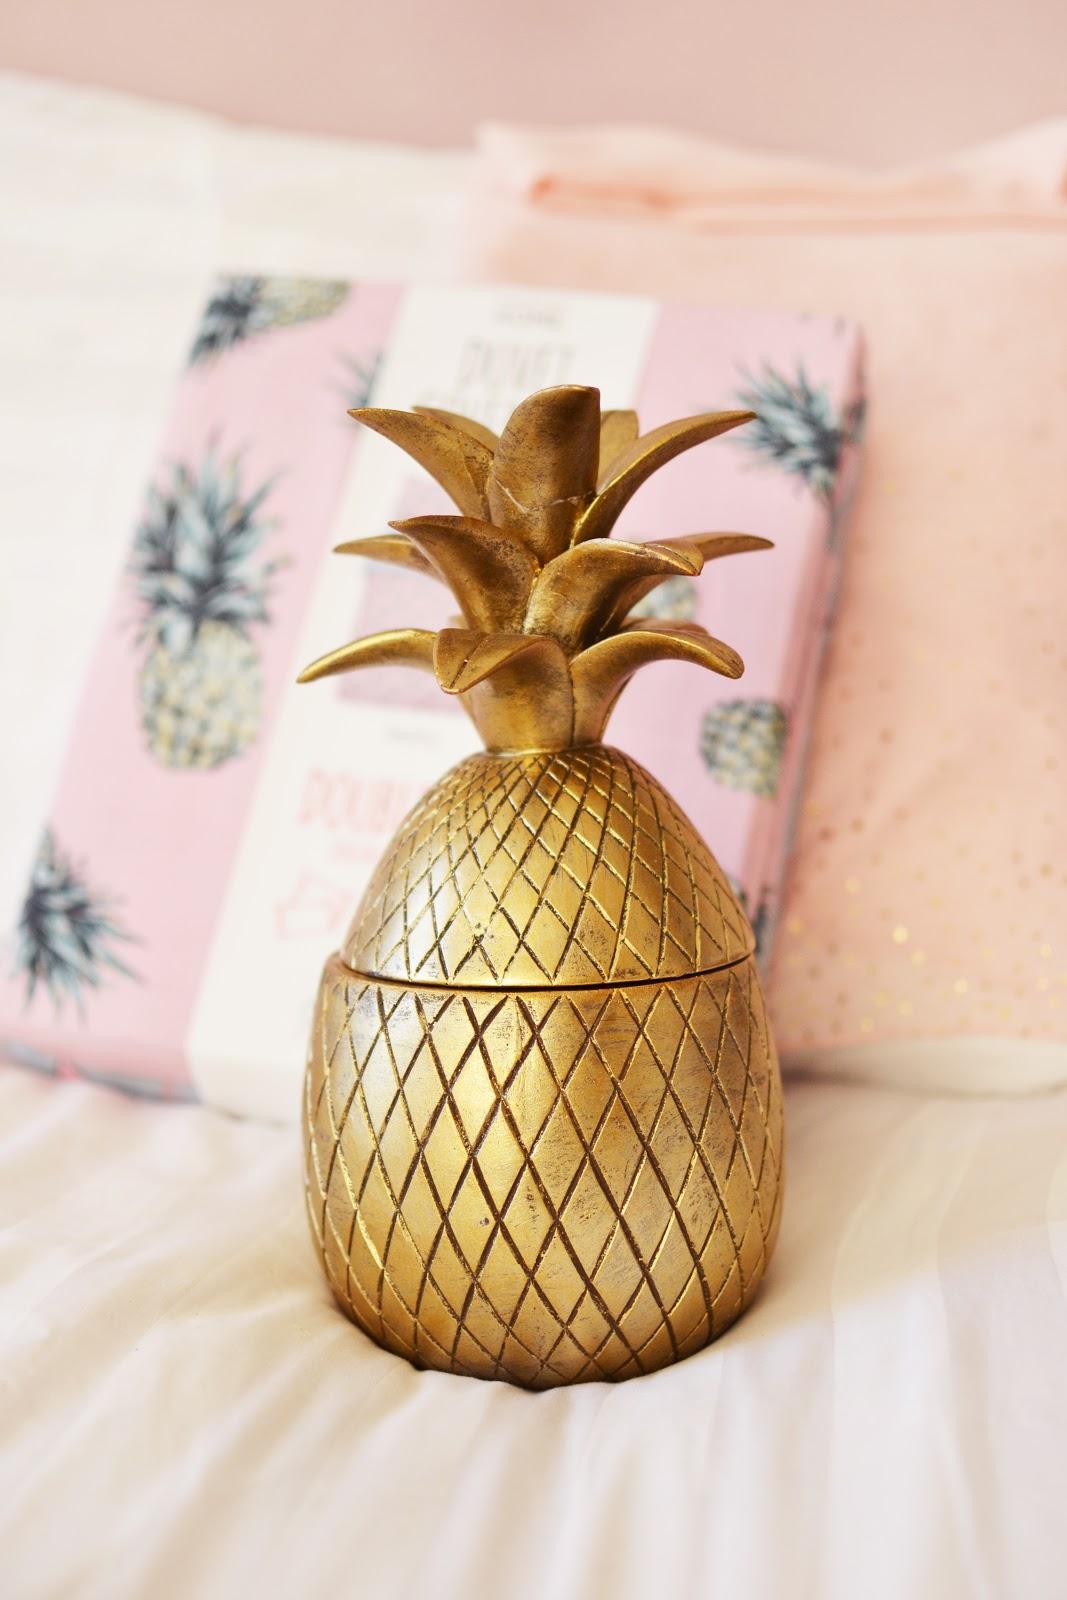 golden pineapple ornament homeware